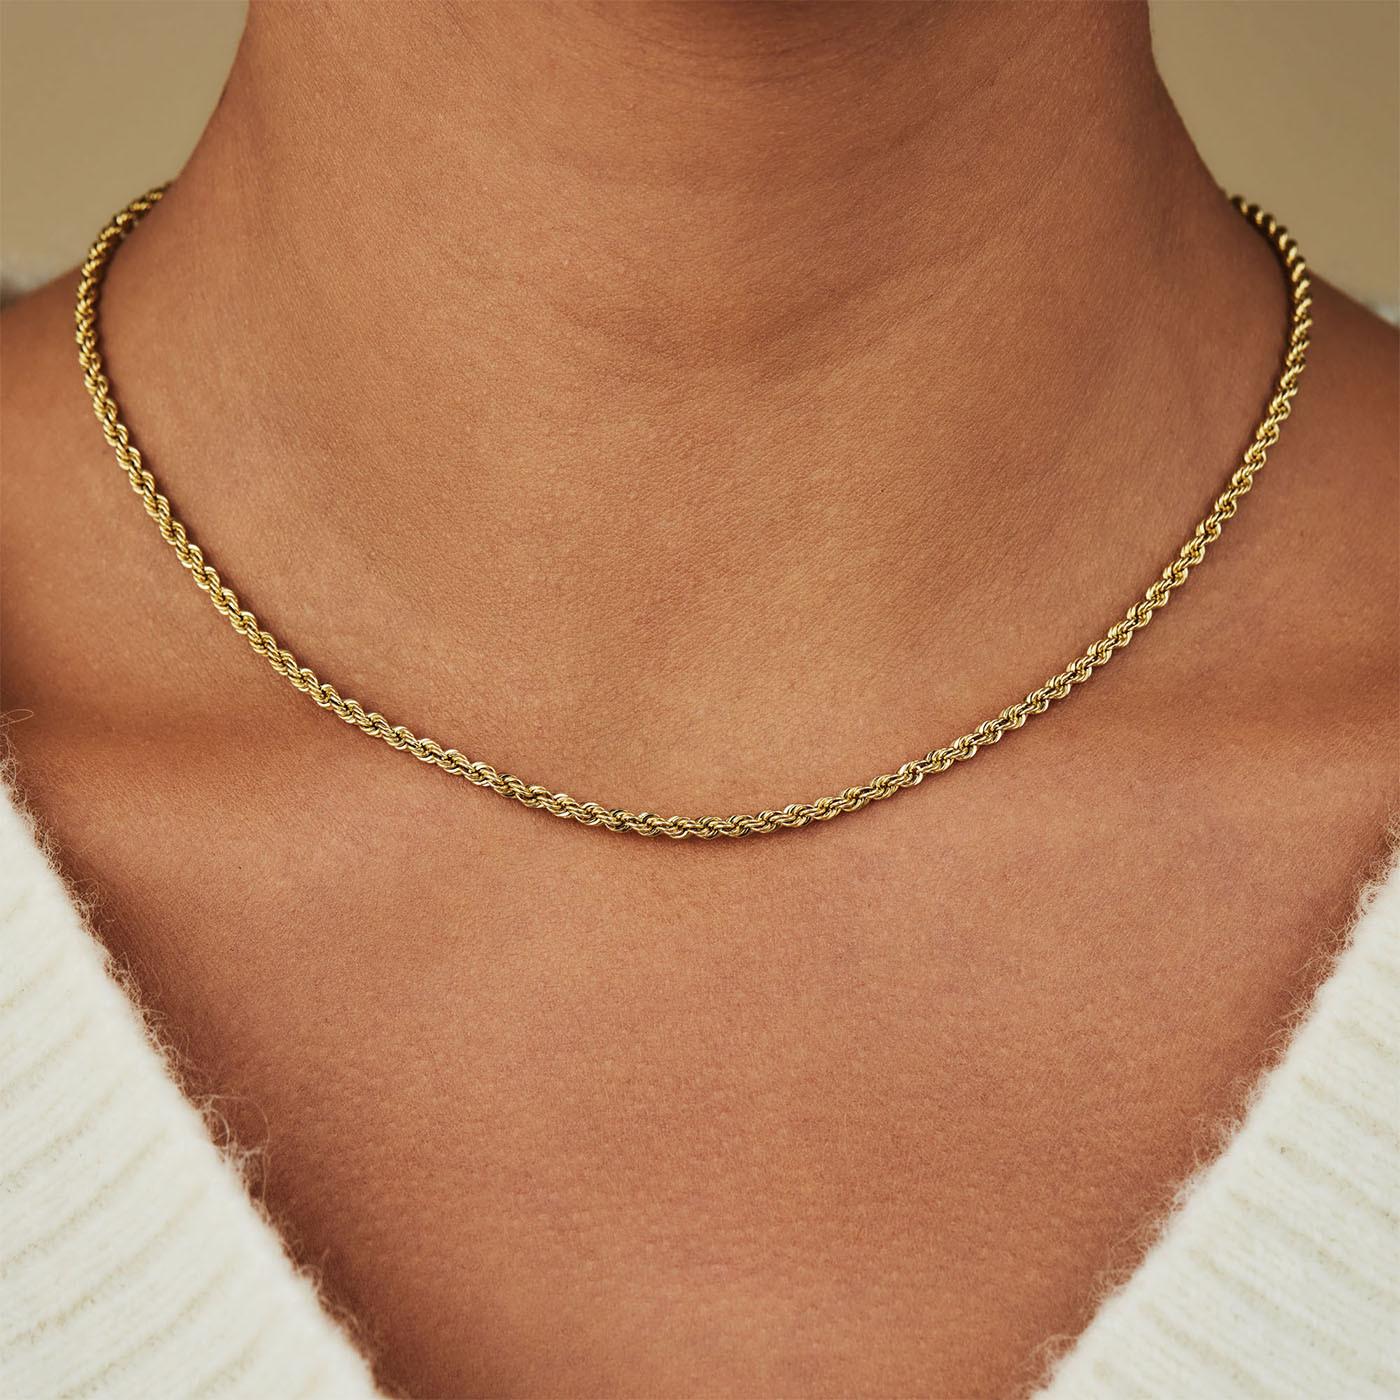 Isabel Bernard 14 Karaat Gouden Rivoli Violette Collier IB340034 (Lengte: 42 cm)